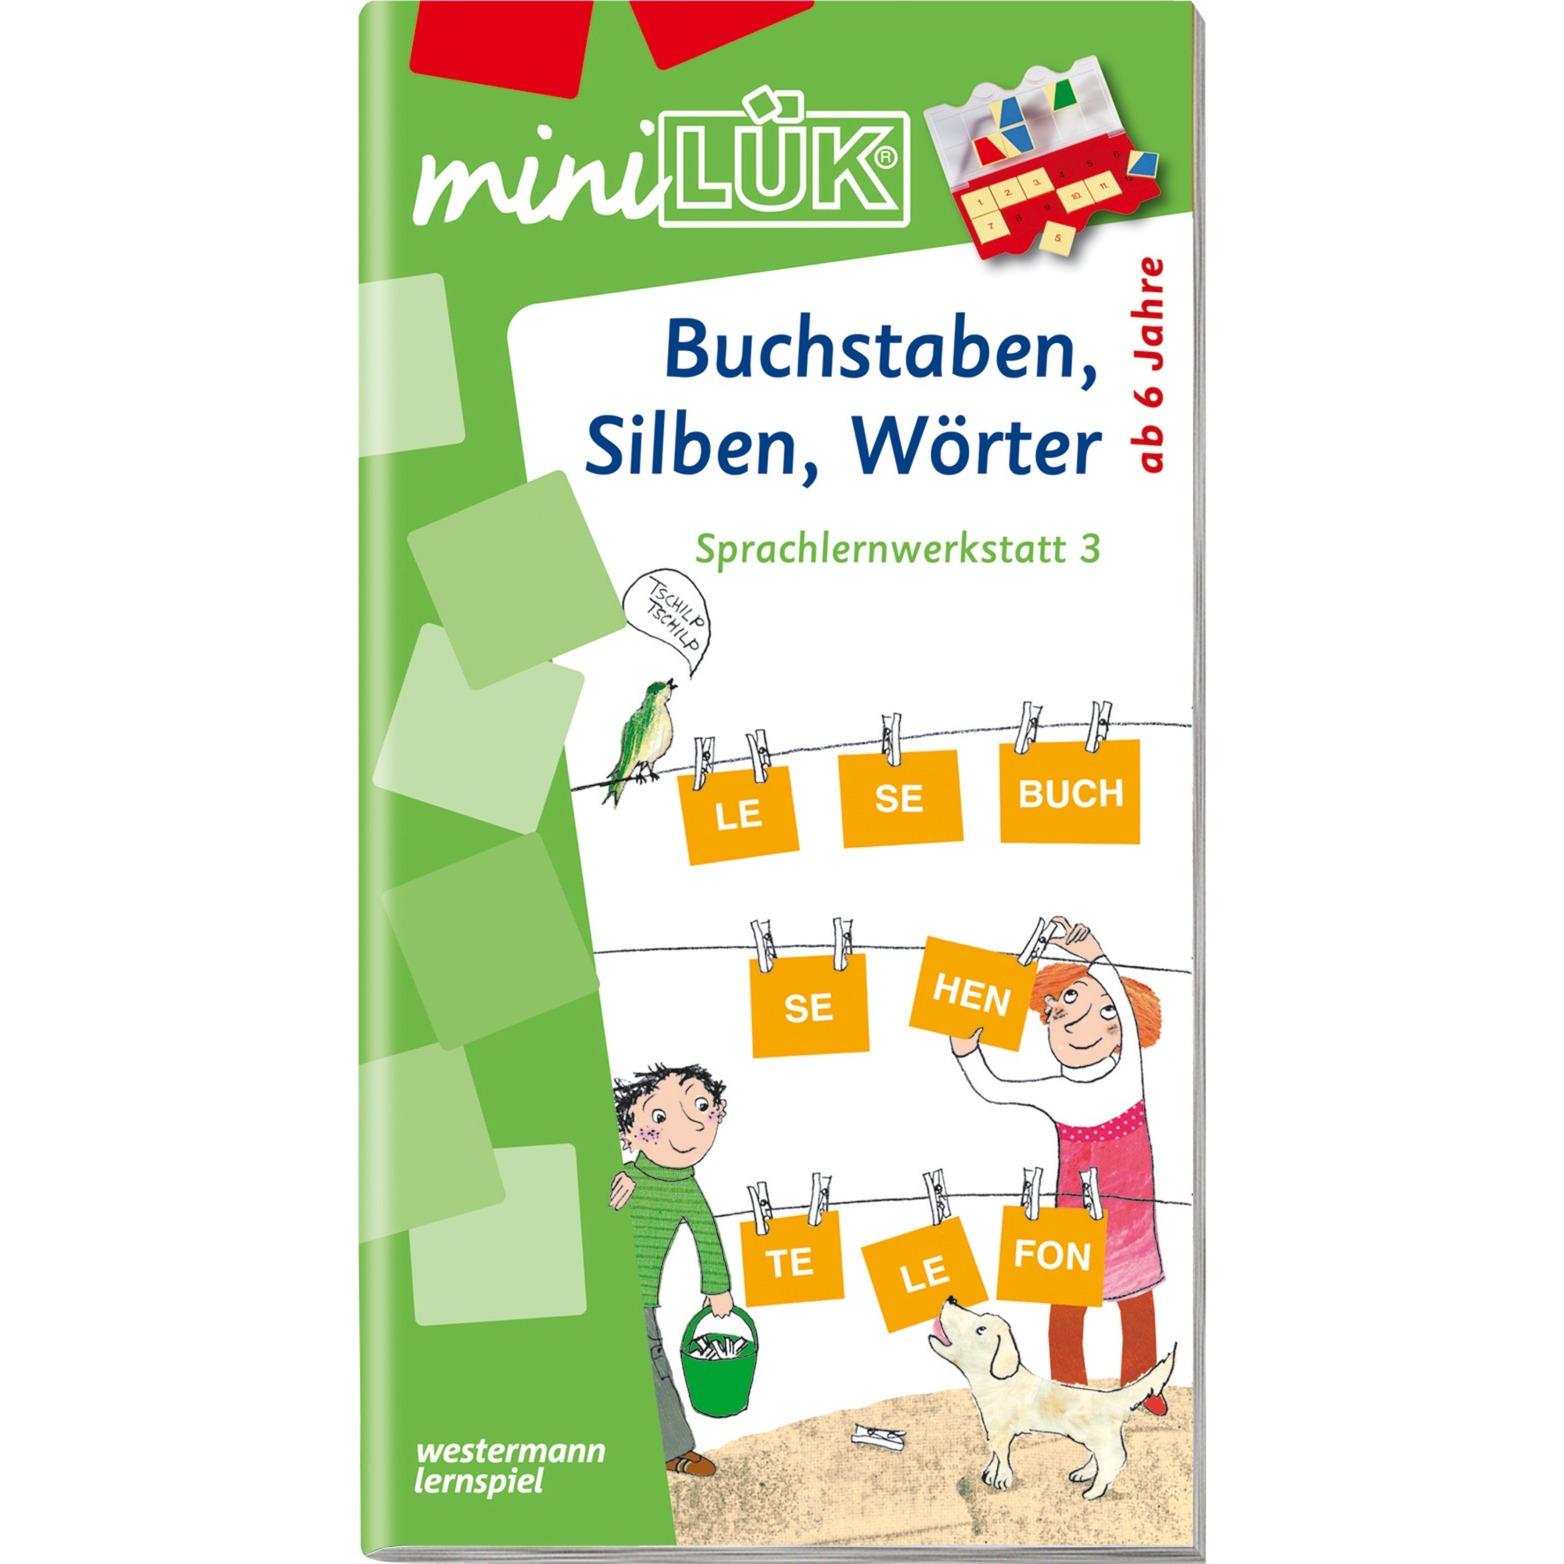 miniluek-buchstaben-silben-woerter-sprachlernwerkstatt-3-fuer-kinder-ab-6-jahren-bornebog-bog-til-indlaring-skolebog